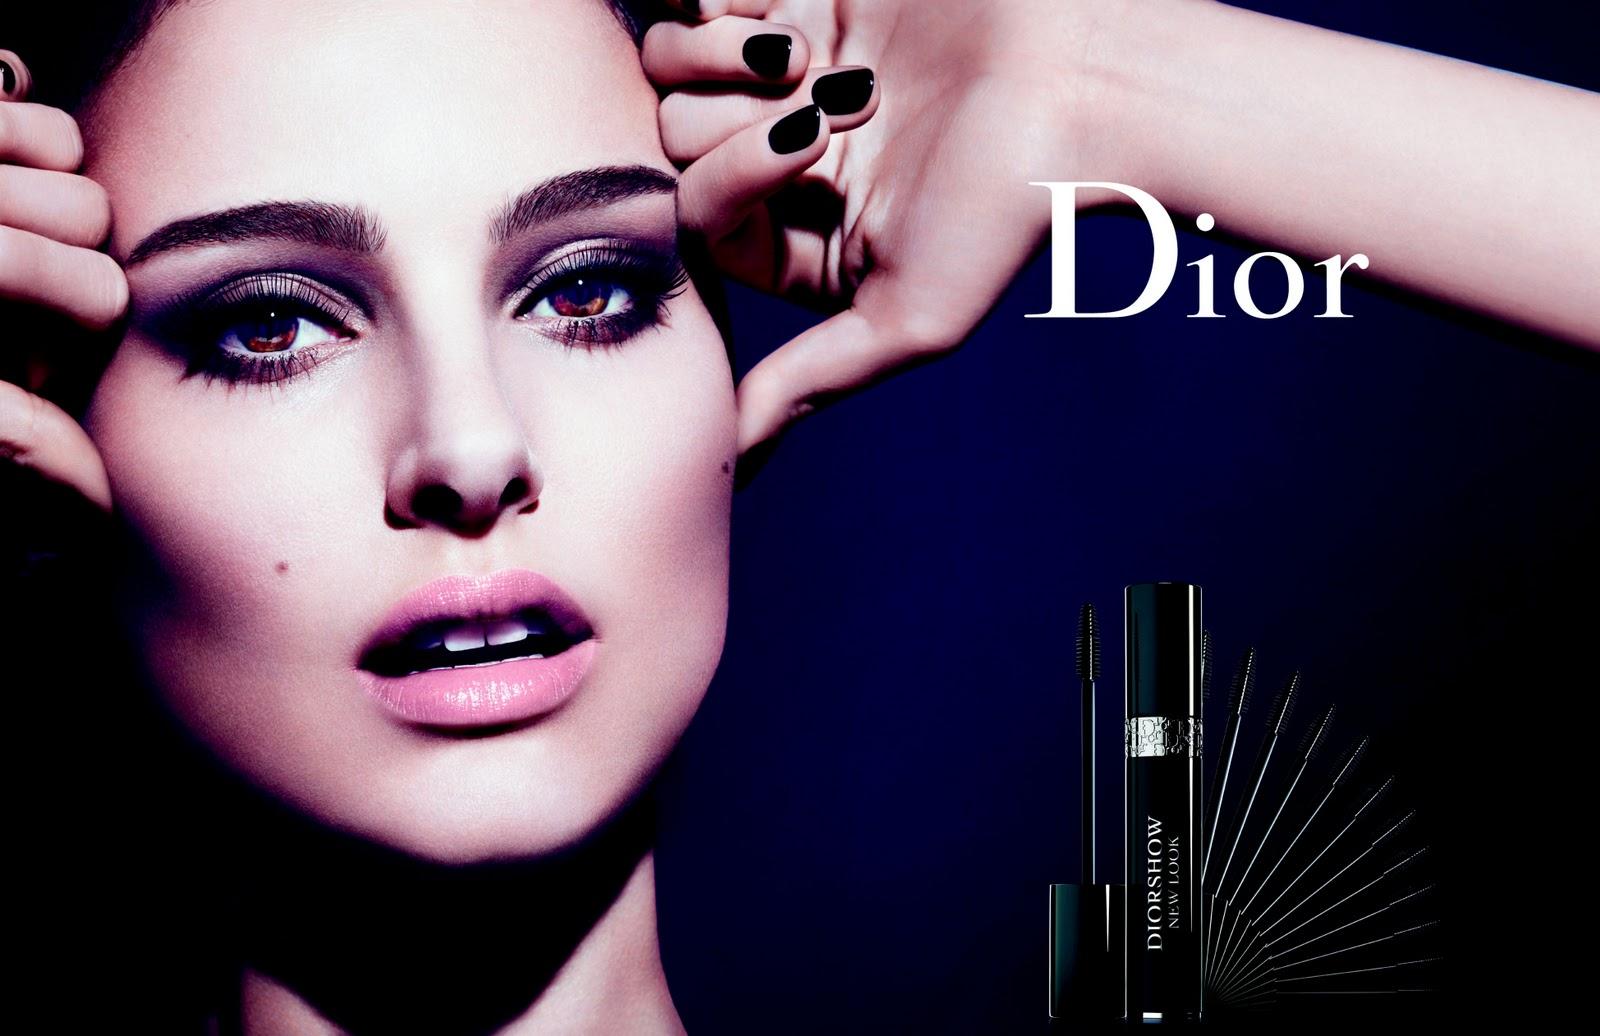 Dior Make Up - Natalie Portman Photo (28087994) - Fanpop